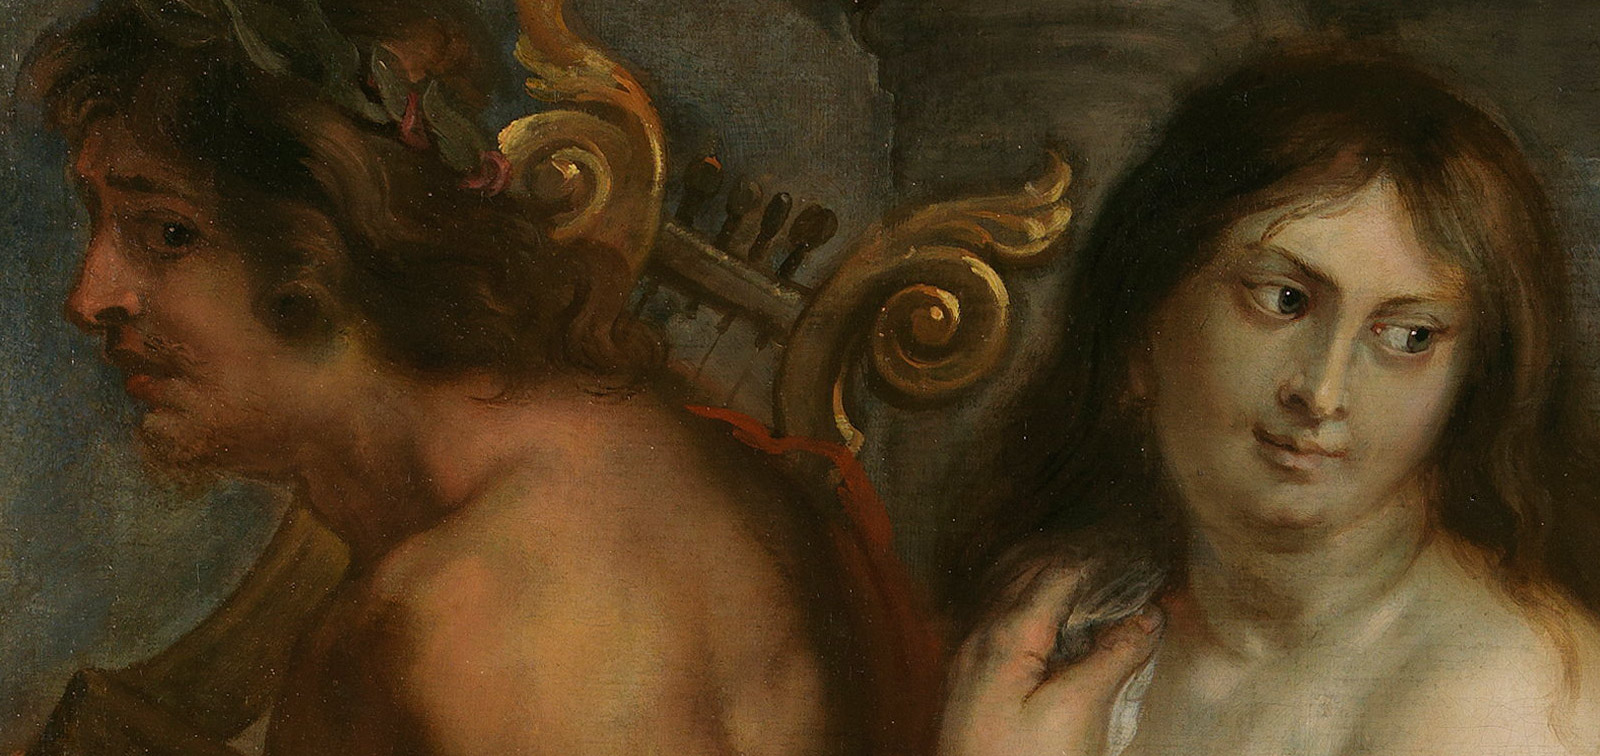 <em>Orfeo y Eurídice de Rubens: música, amor y muerte</em>